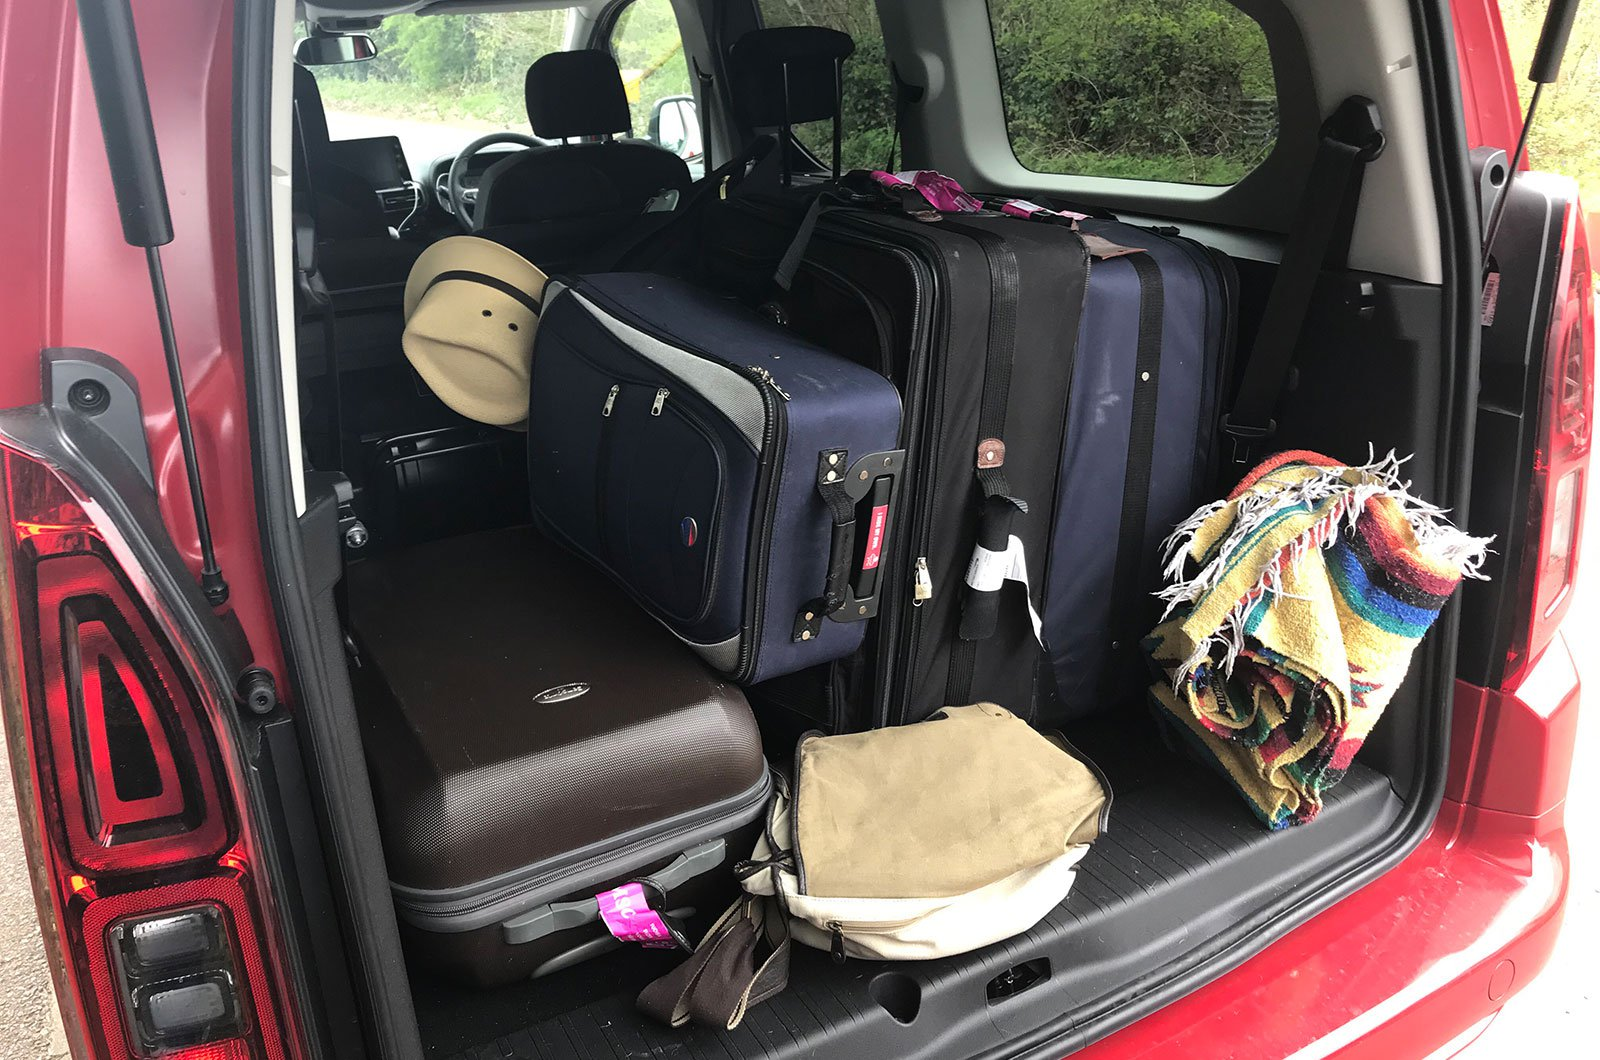 Vauxhall Combo Life boot